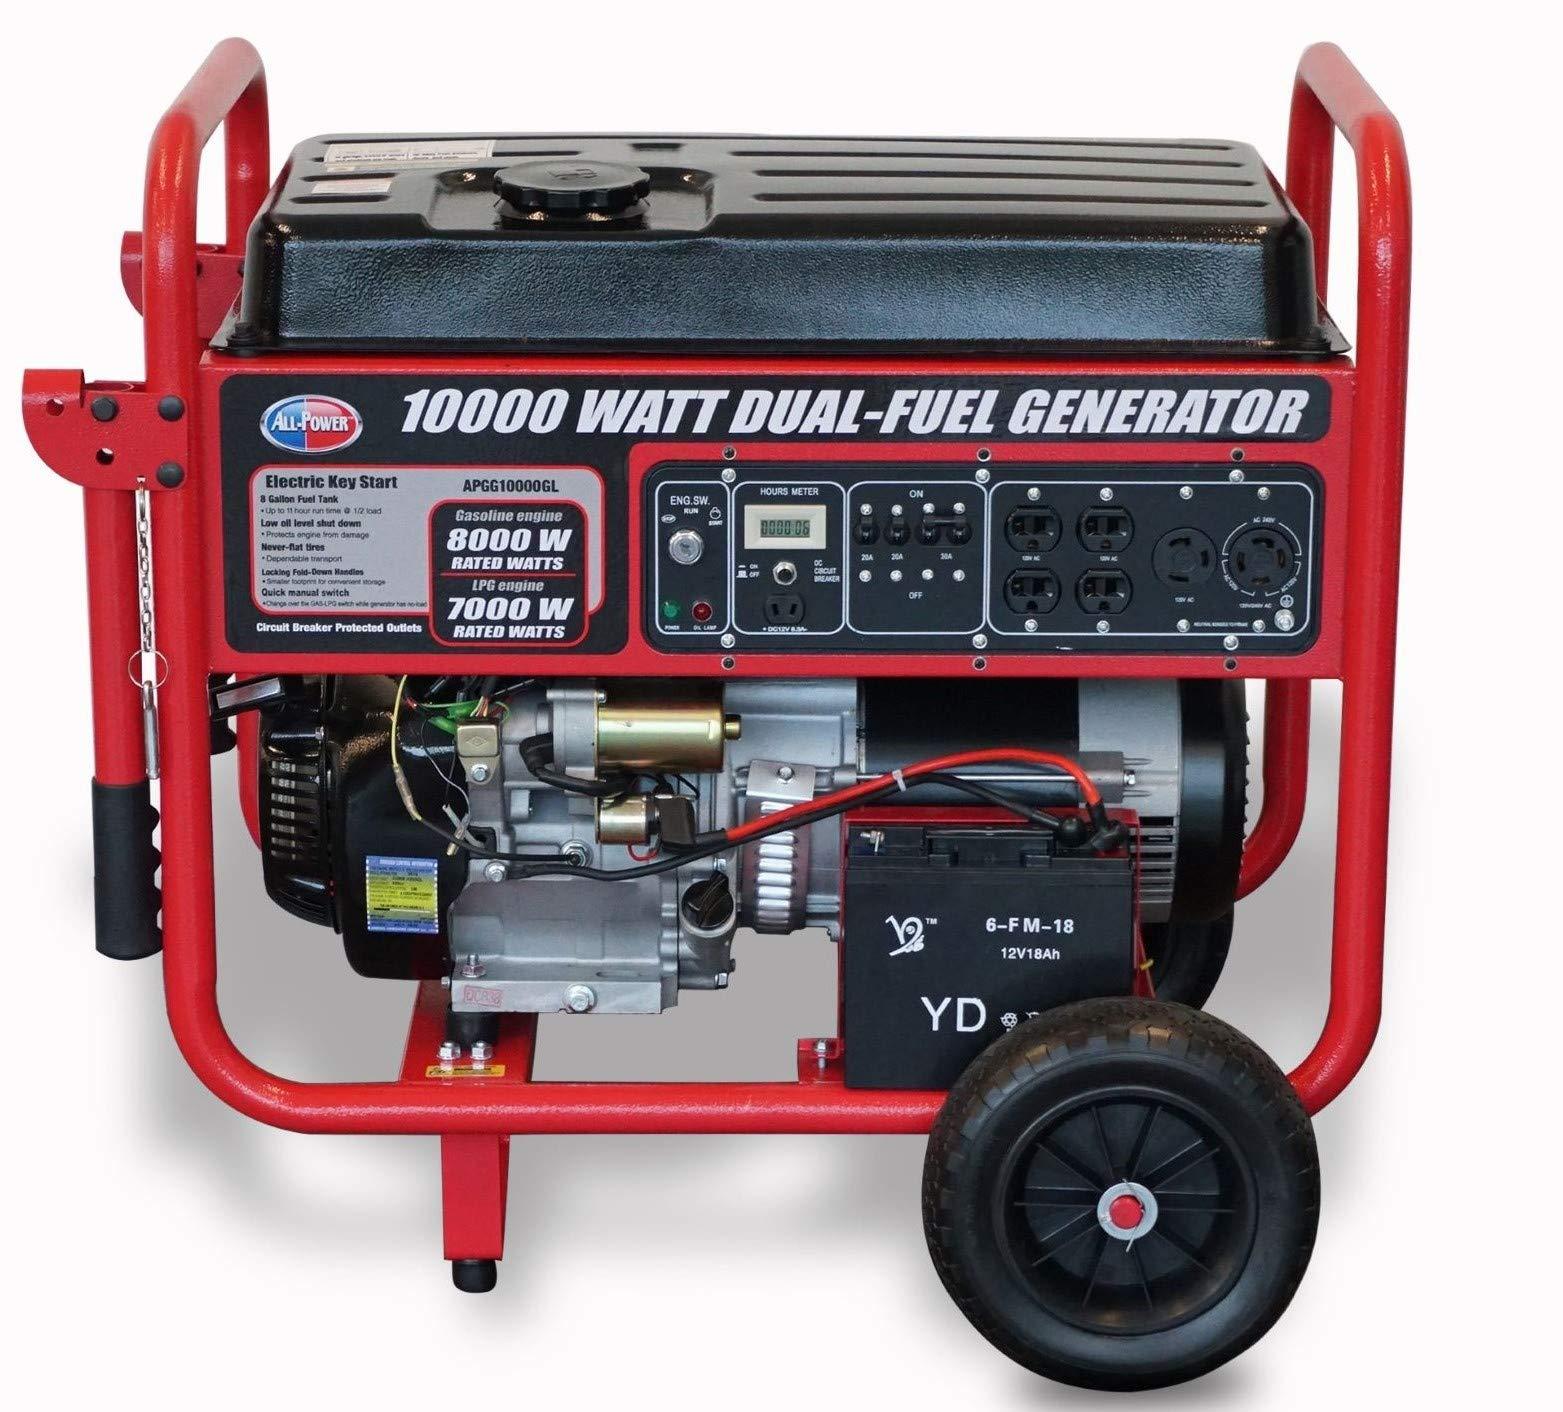 All Power America 10000 Watt Dual Fuel Generator w/ Electric Start, APGG10000GL 10000W Gas/Propane Portable Generator, Red/Black